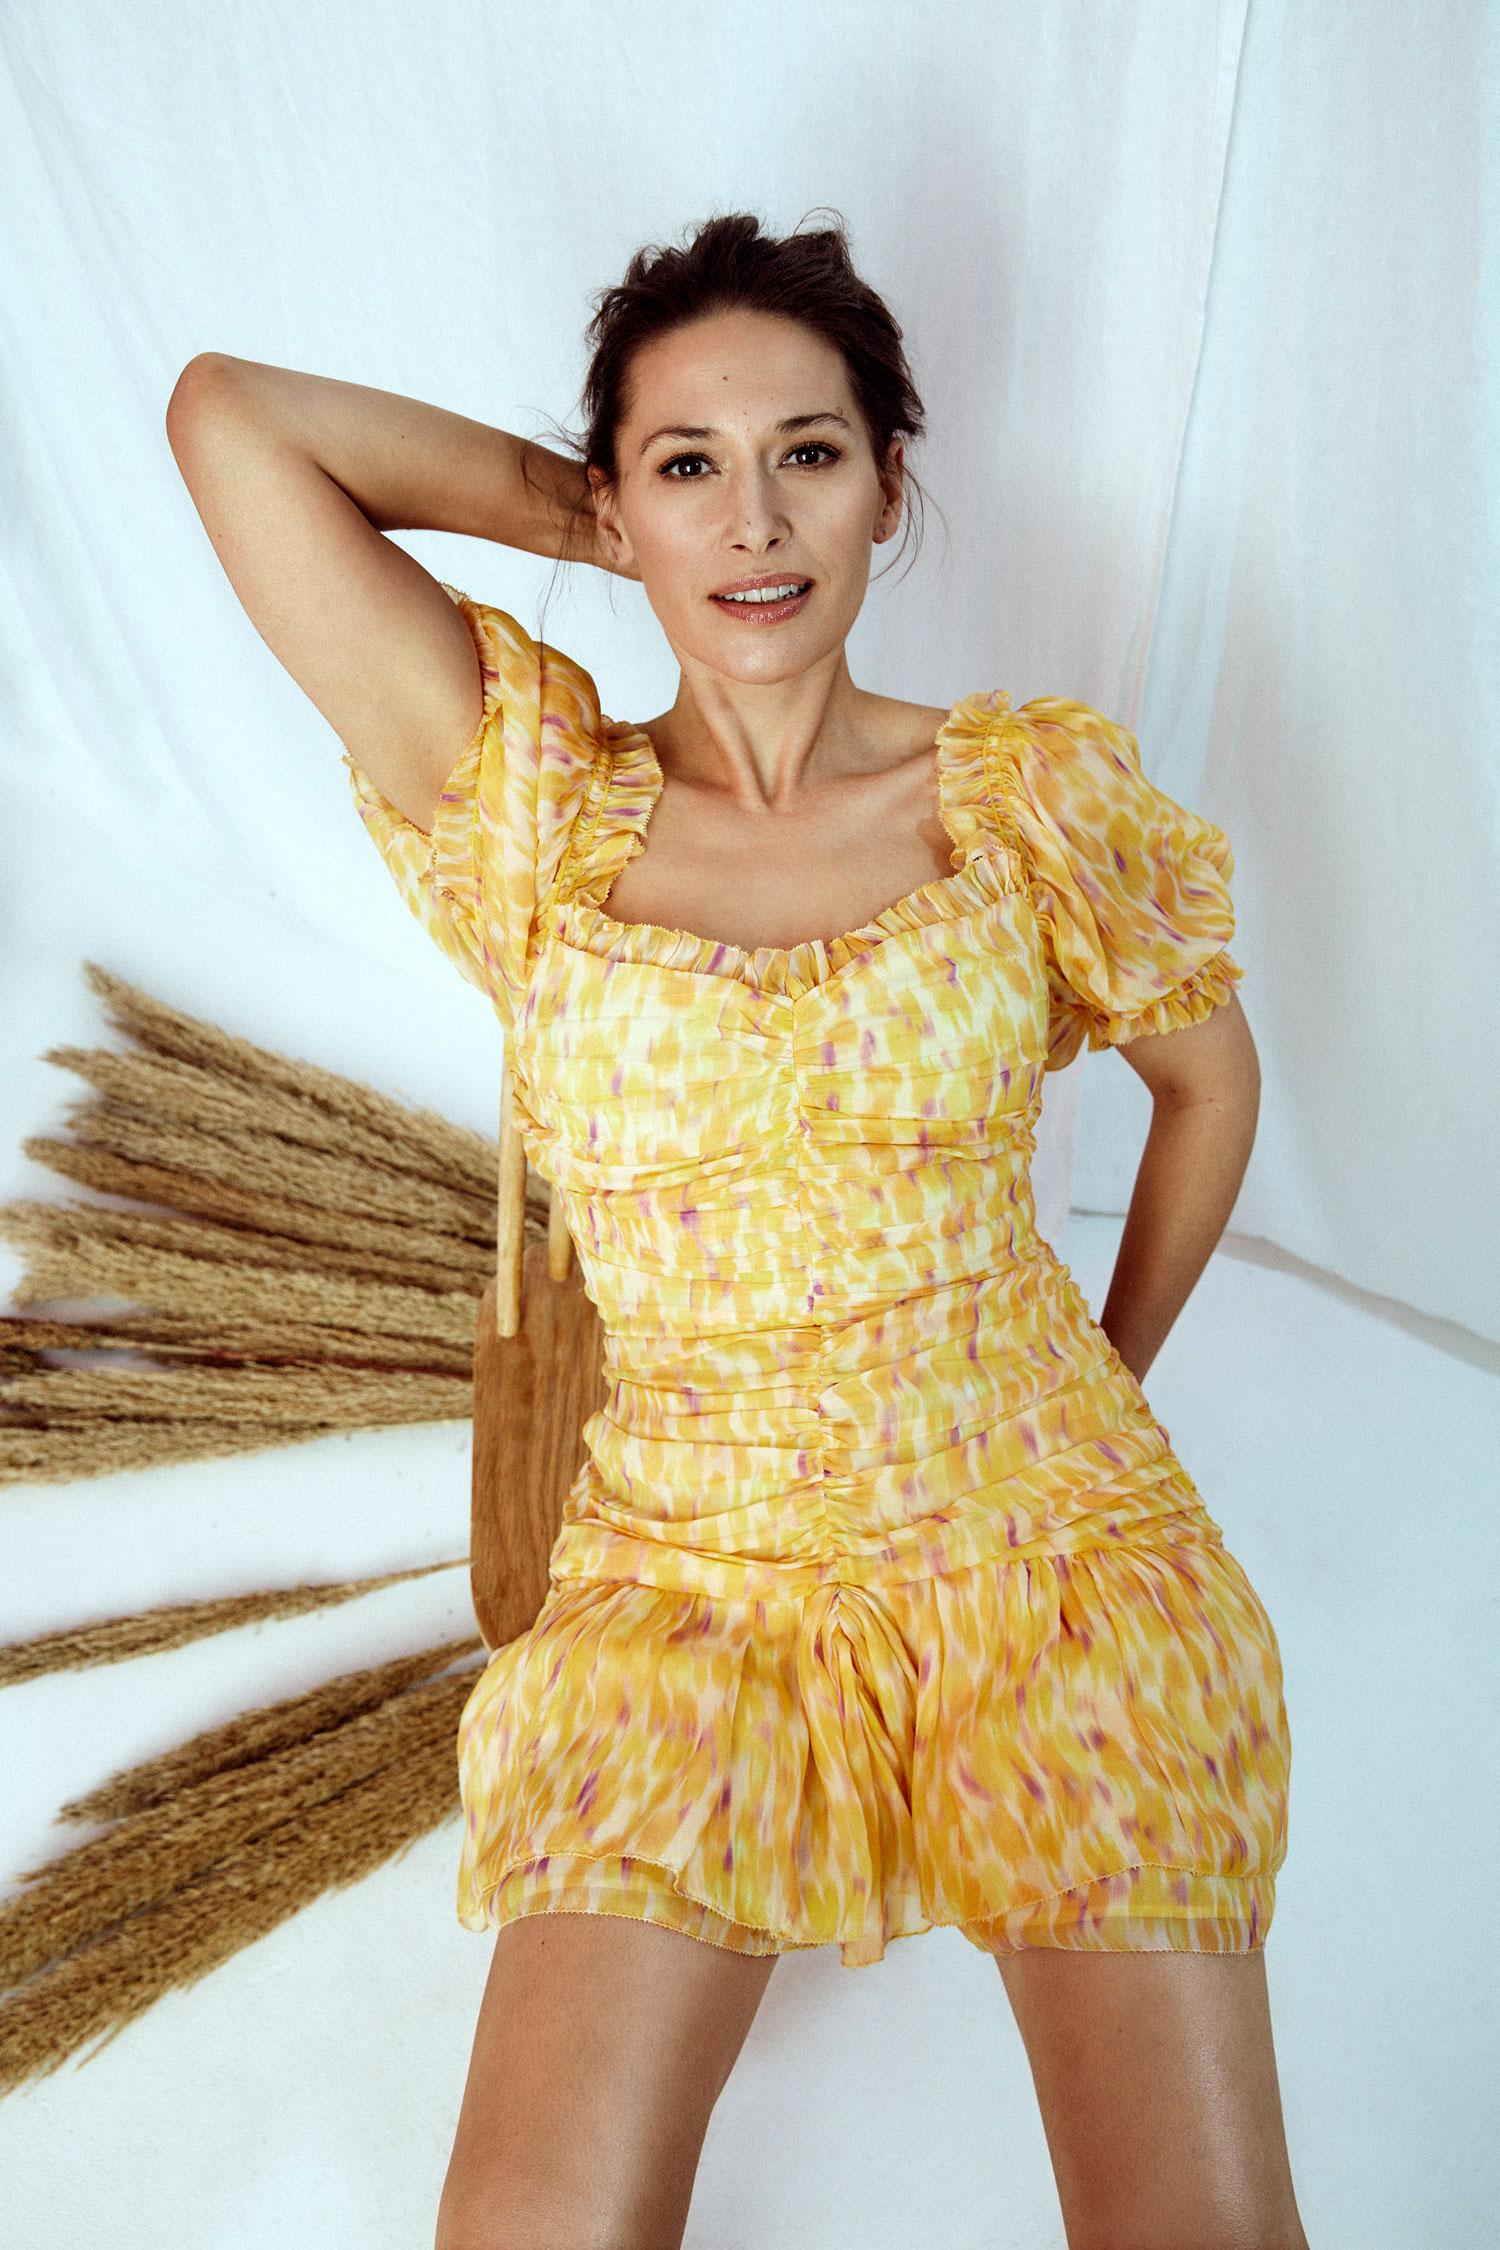 Pia-Tjelta-SS19_Katharina-Short-Dress-Ikat-Kiss-Sunny-Yellow_-NOK3400..jpg